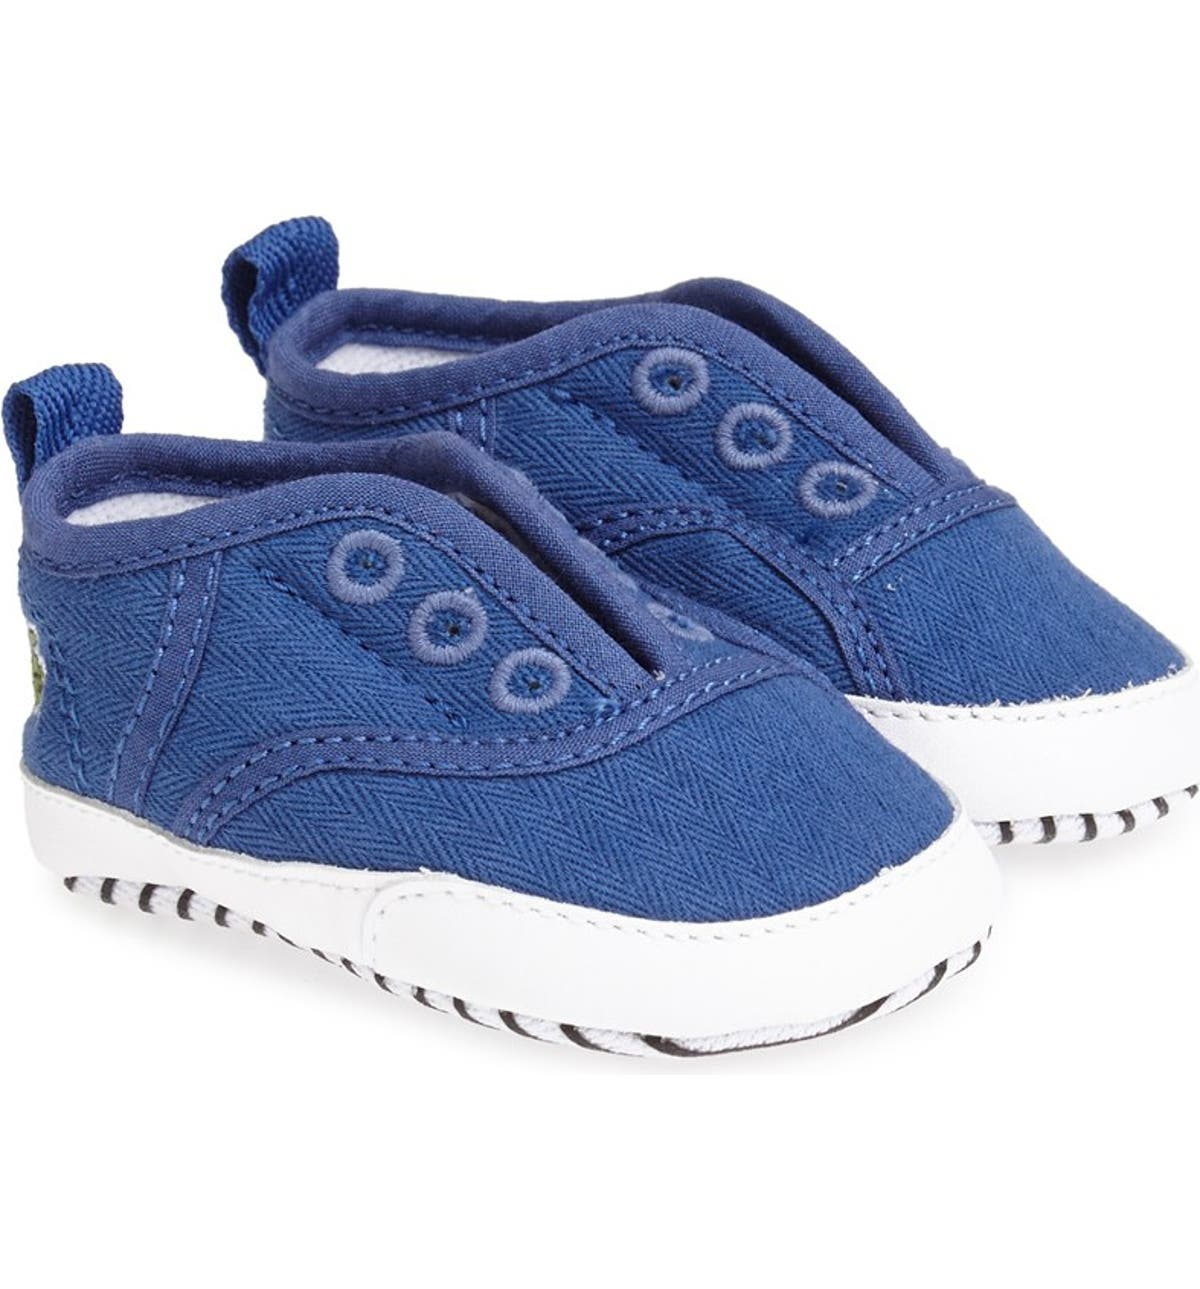 2d41f35c Lacoste 'Rene' Crib Shoe (Baby) | Nordstrom